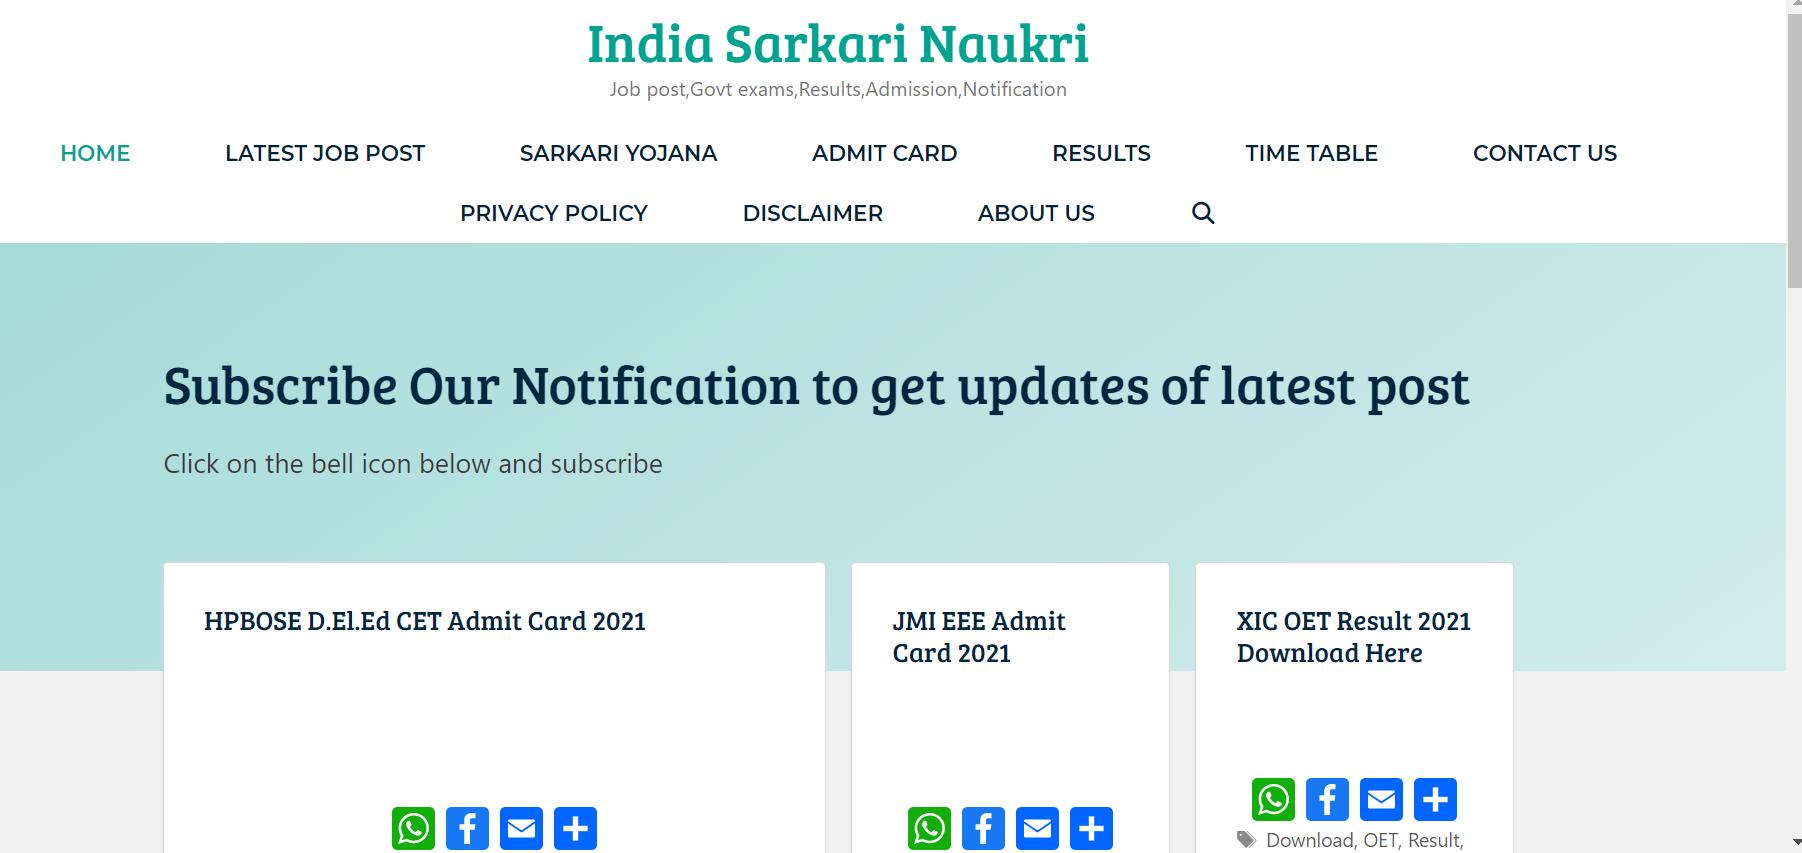 India Sarkari Naukri